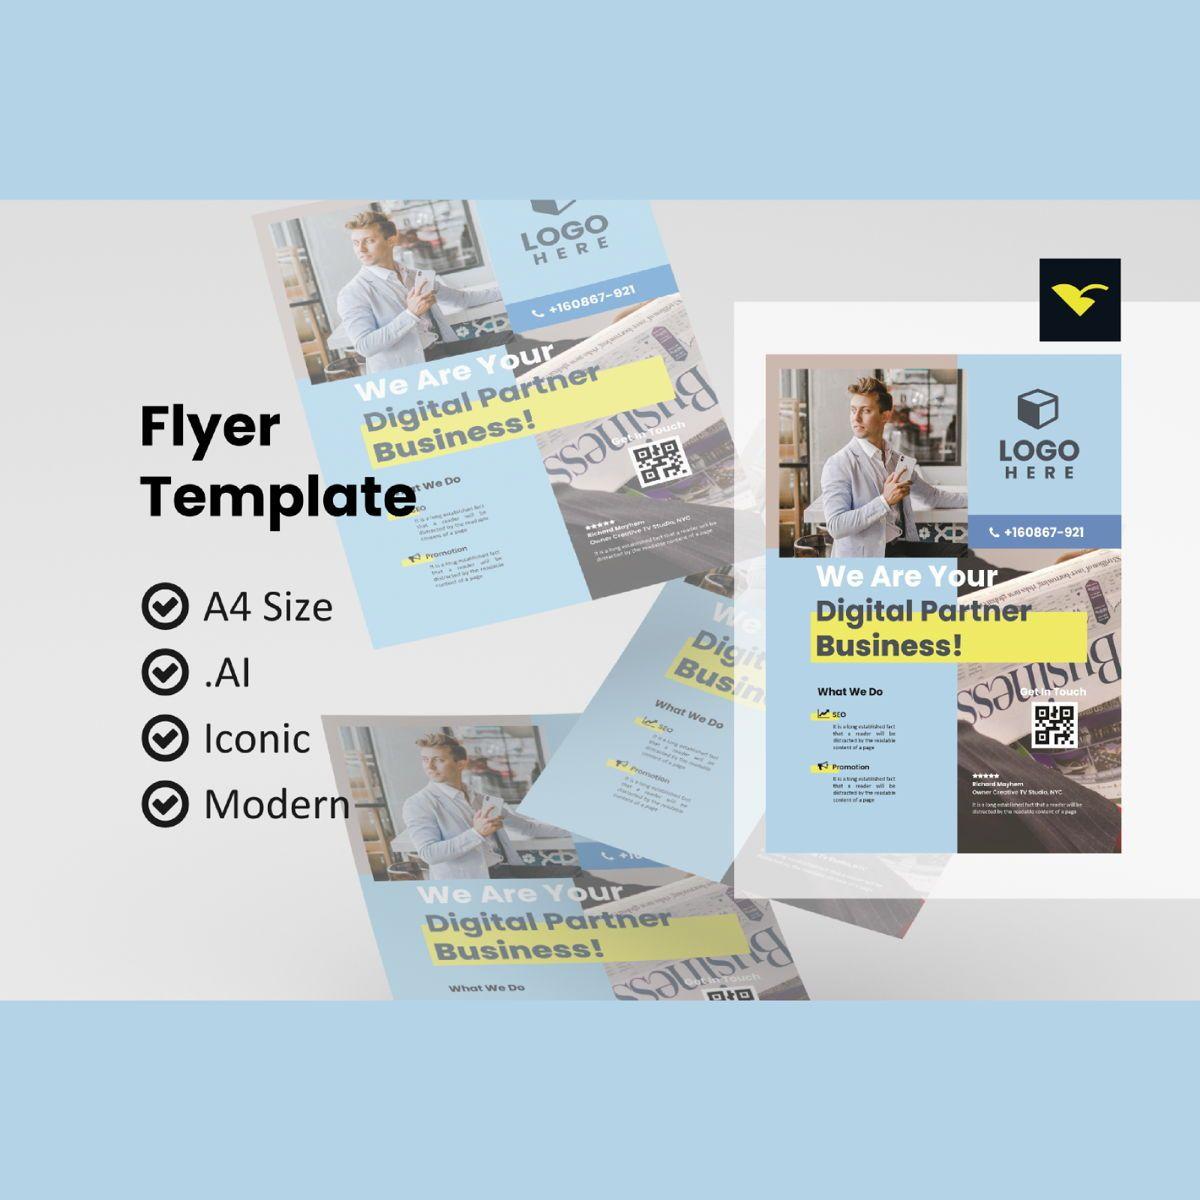 Flyer business design tempalte, 08965, Business — PoweredTemplate.com